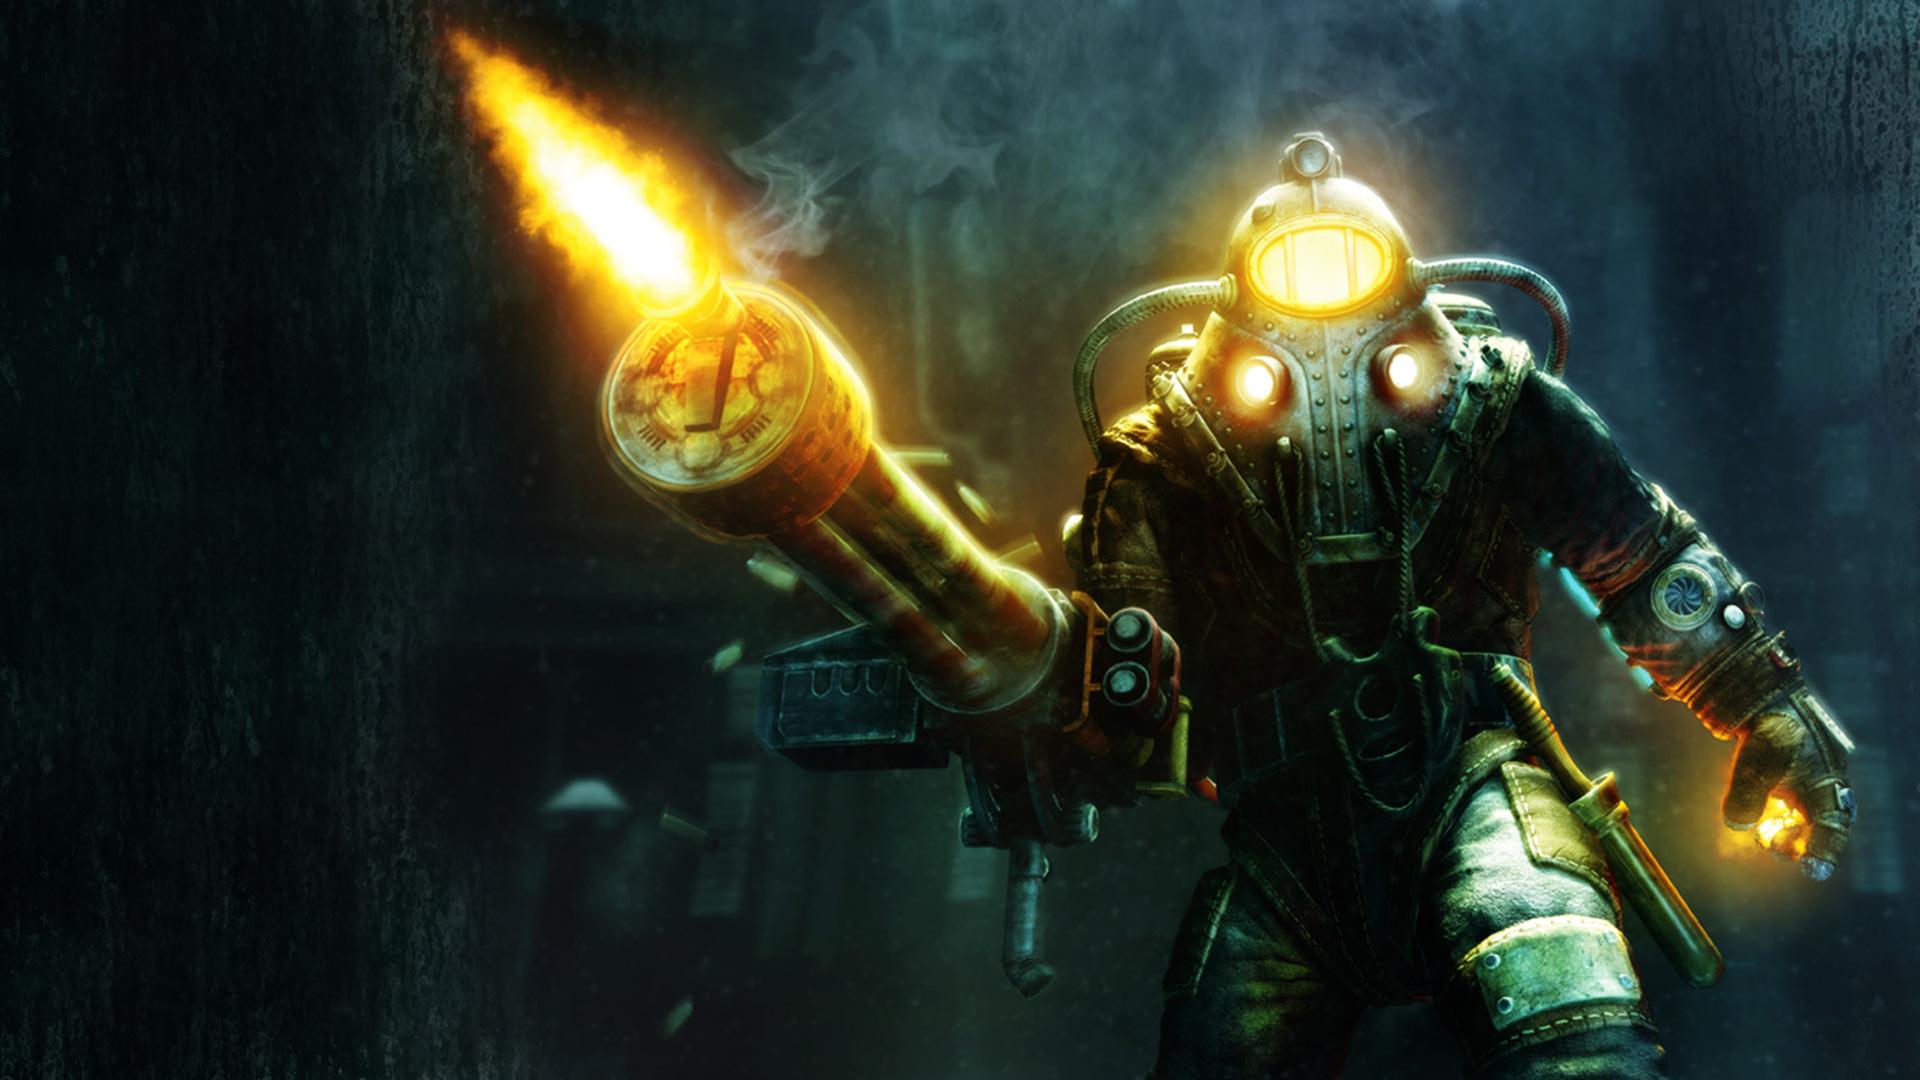 Bioshock 2 wallpaper 3